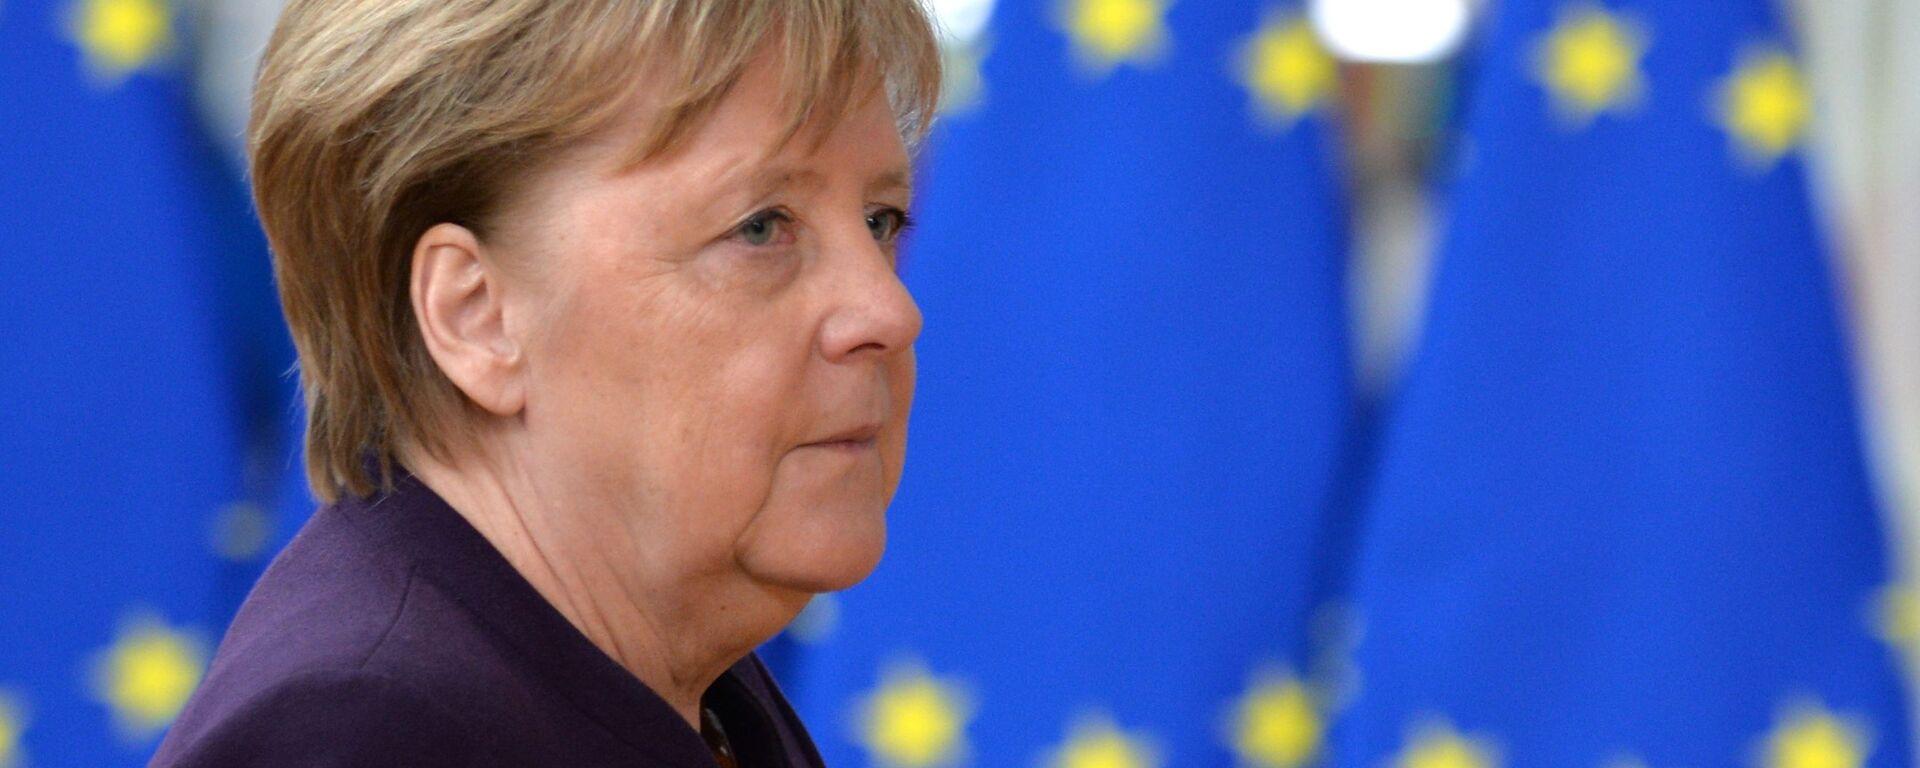 Angela Merkel - Sputnik Polska, 1920, 14.08.2021